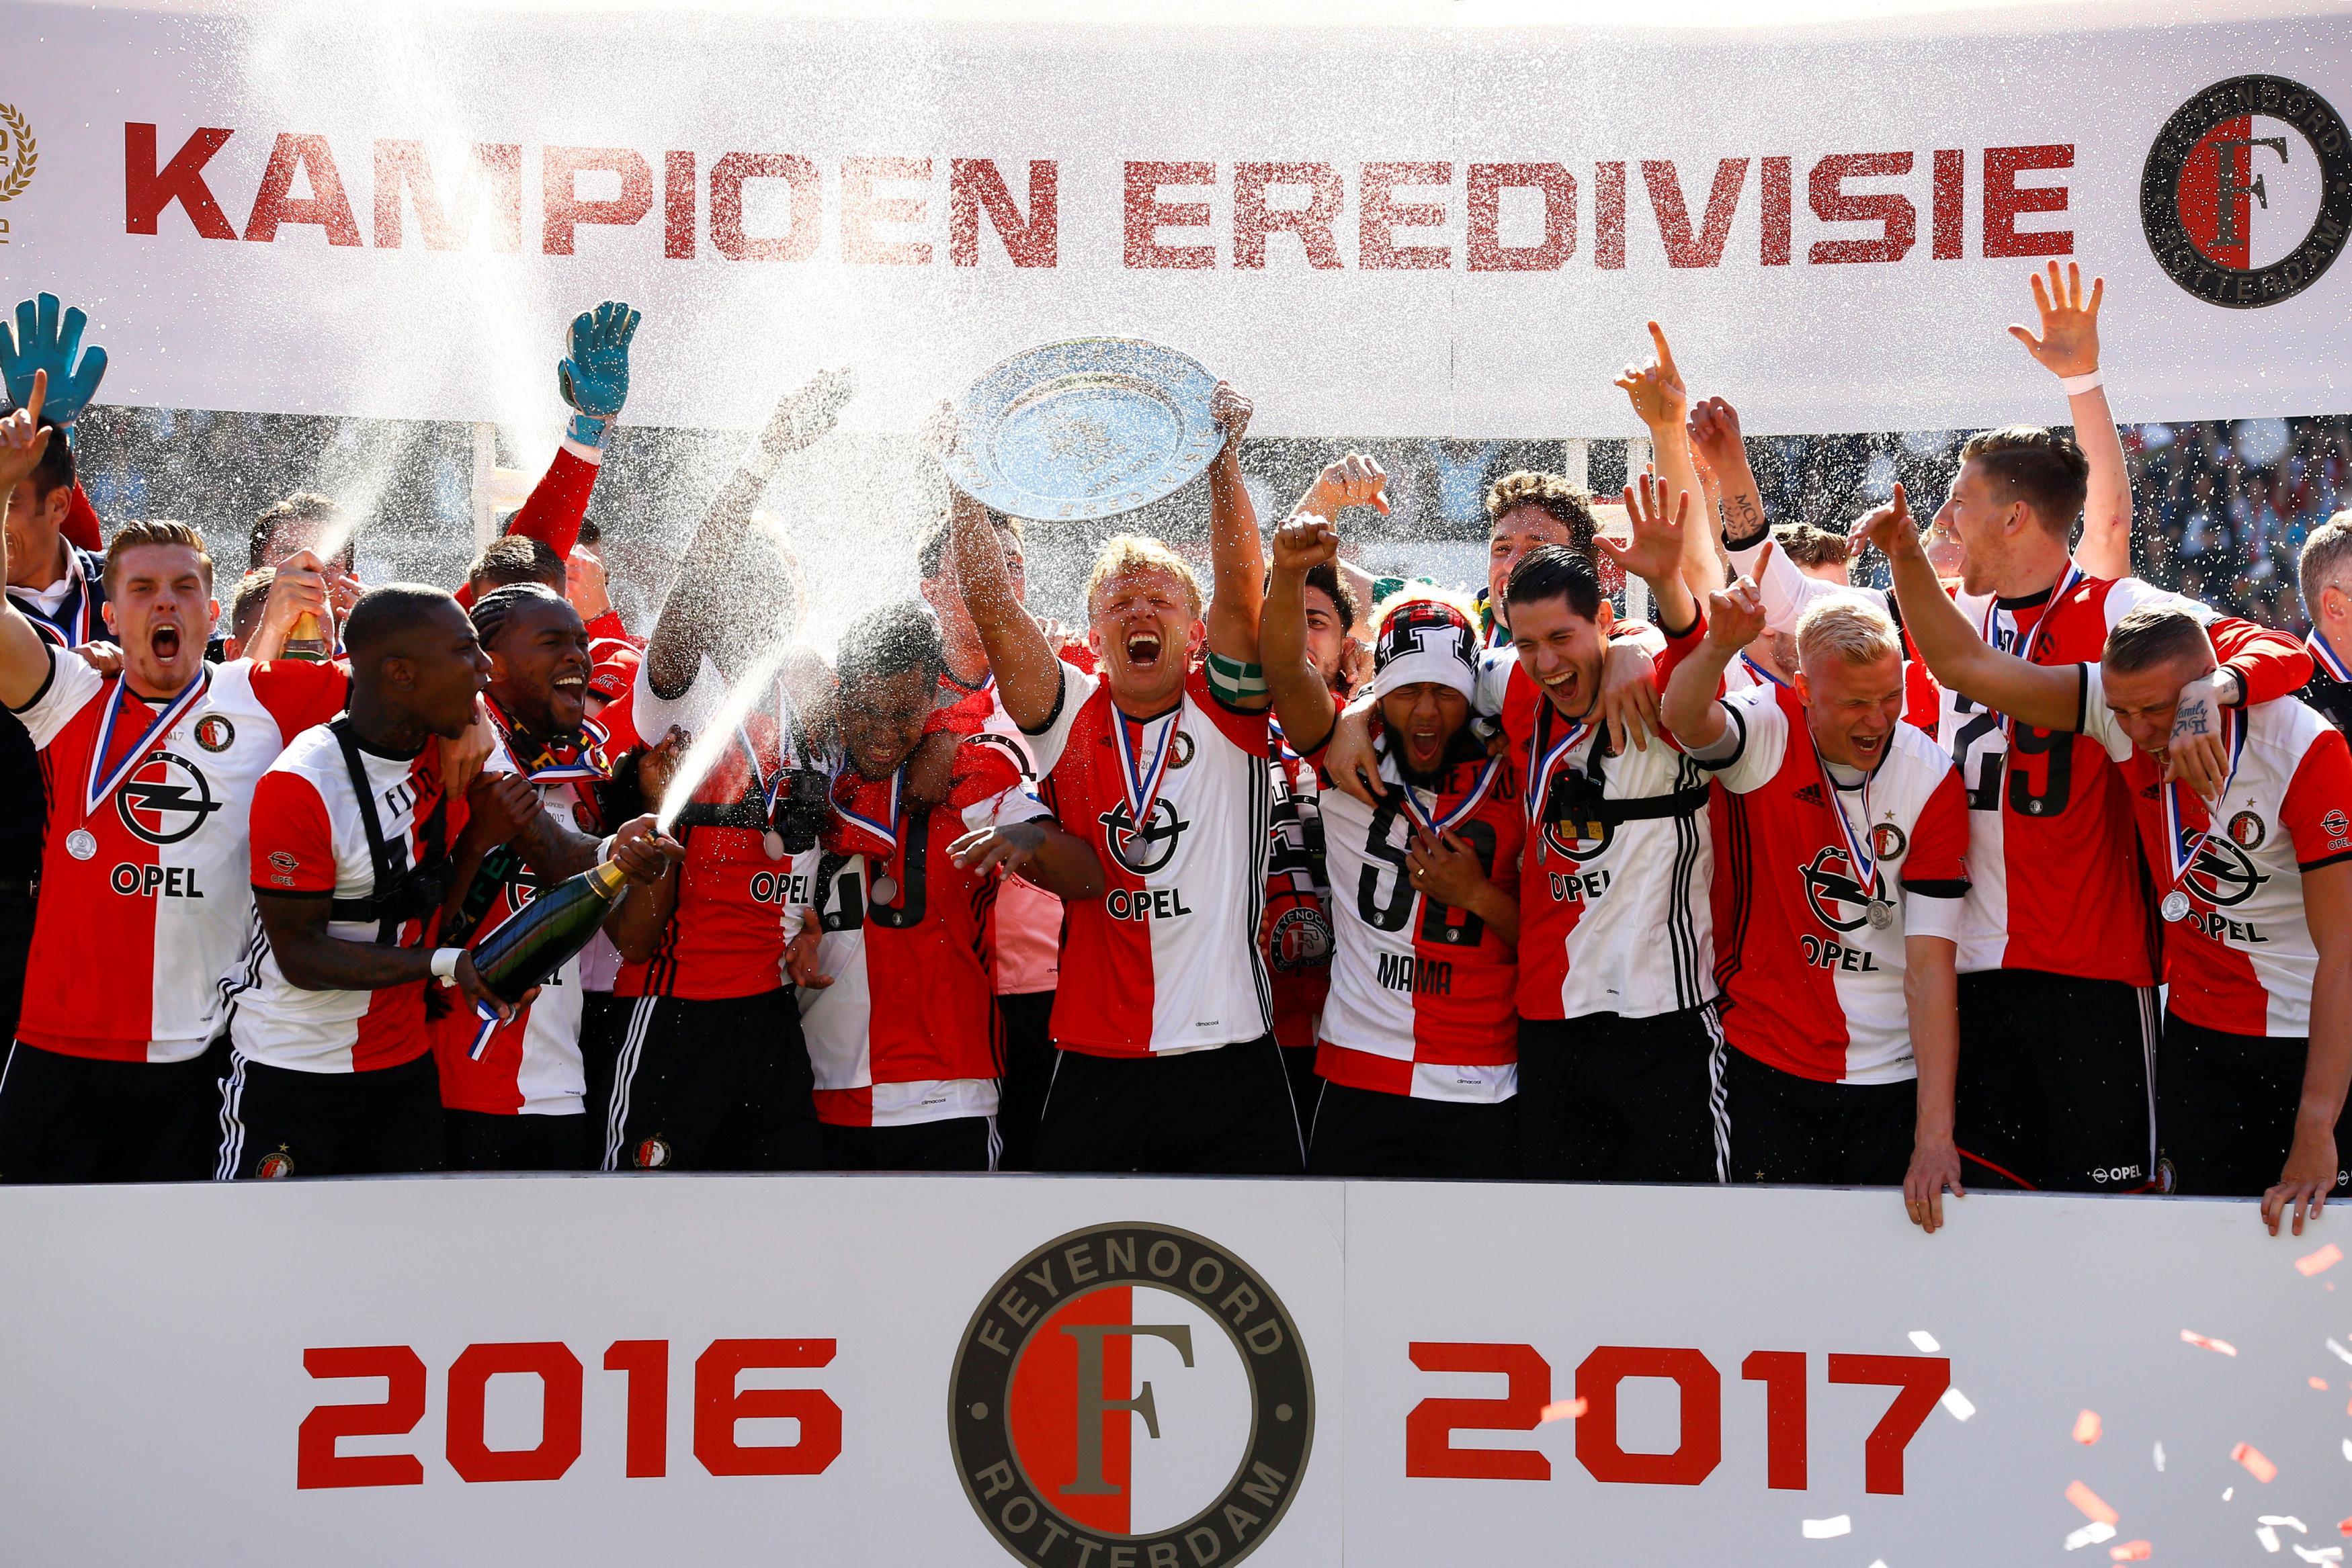 Kuyt secured Feyenoord their first league title in 18 years last season